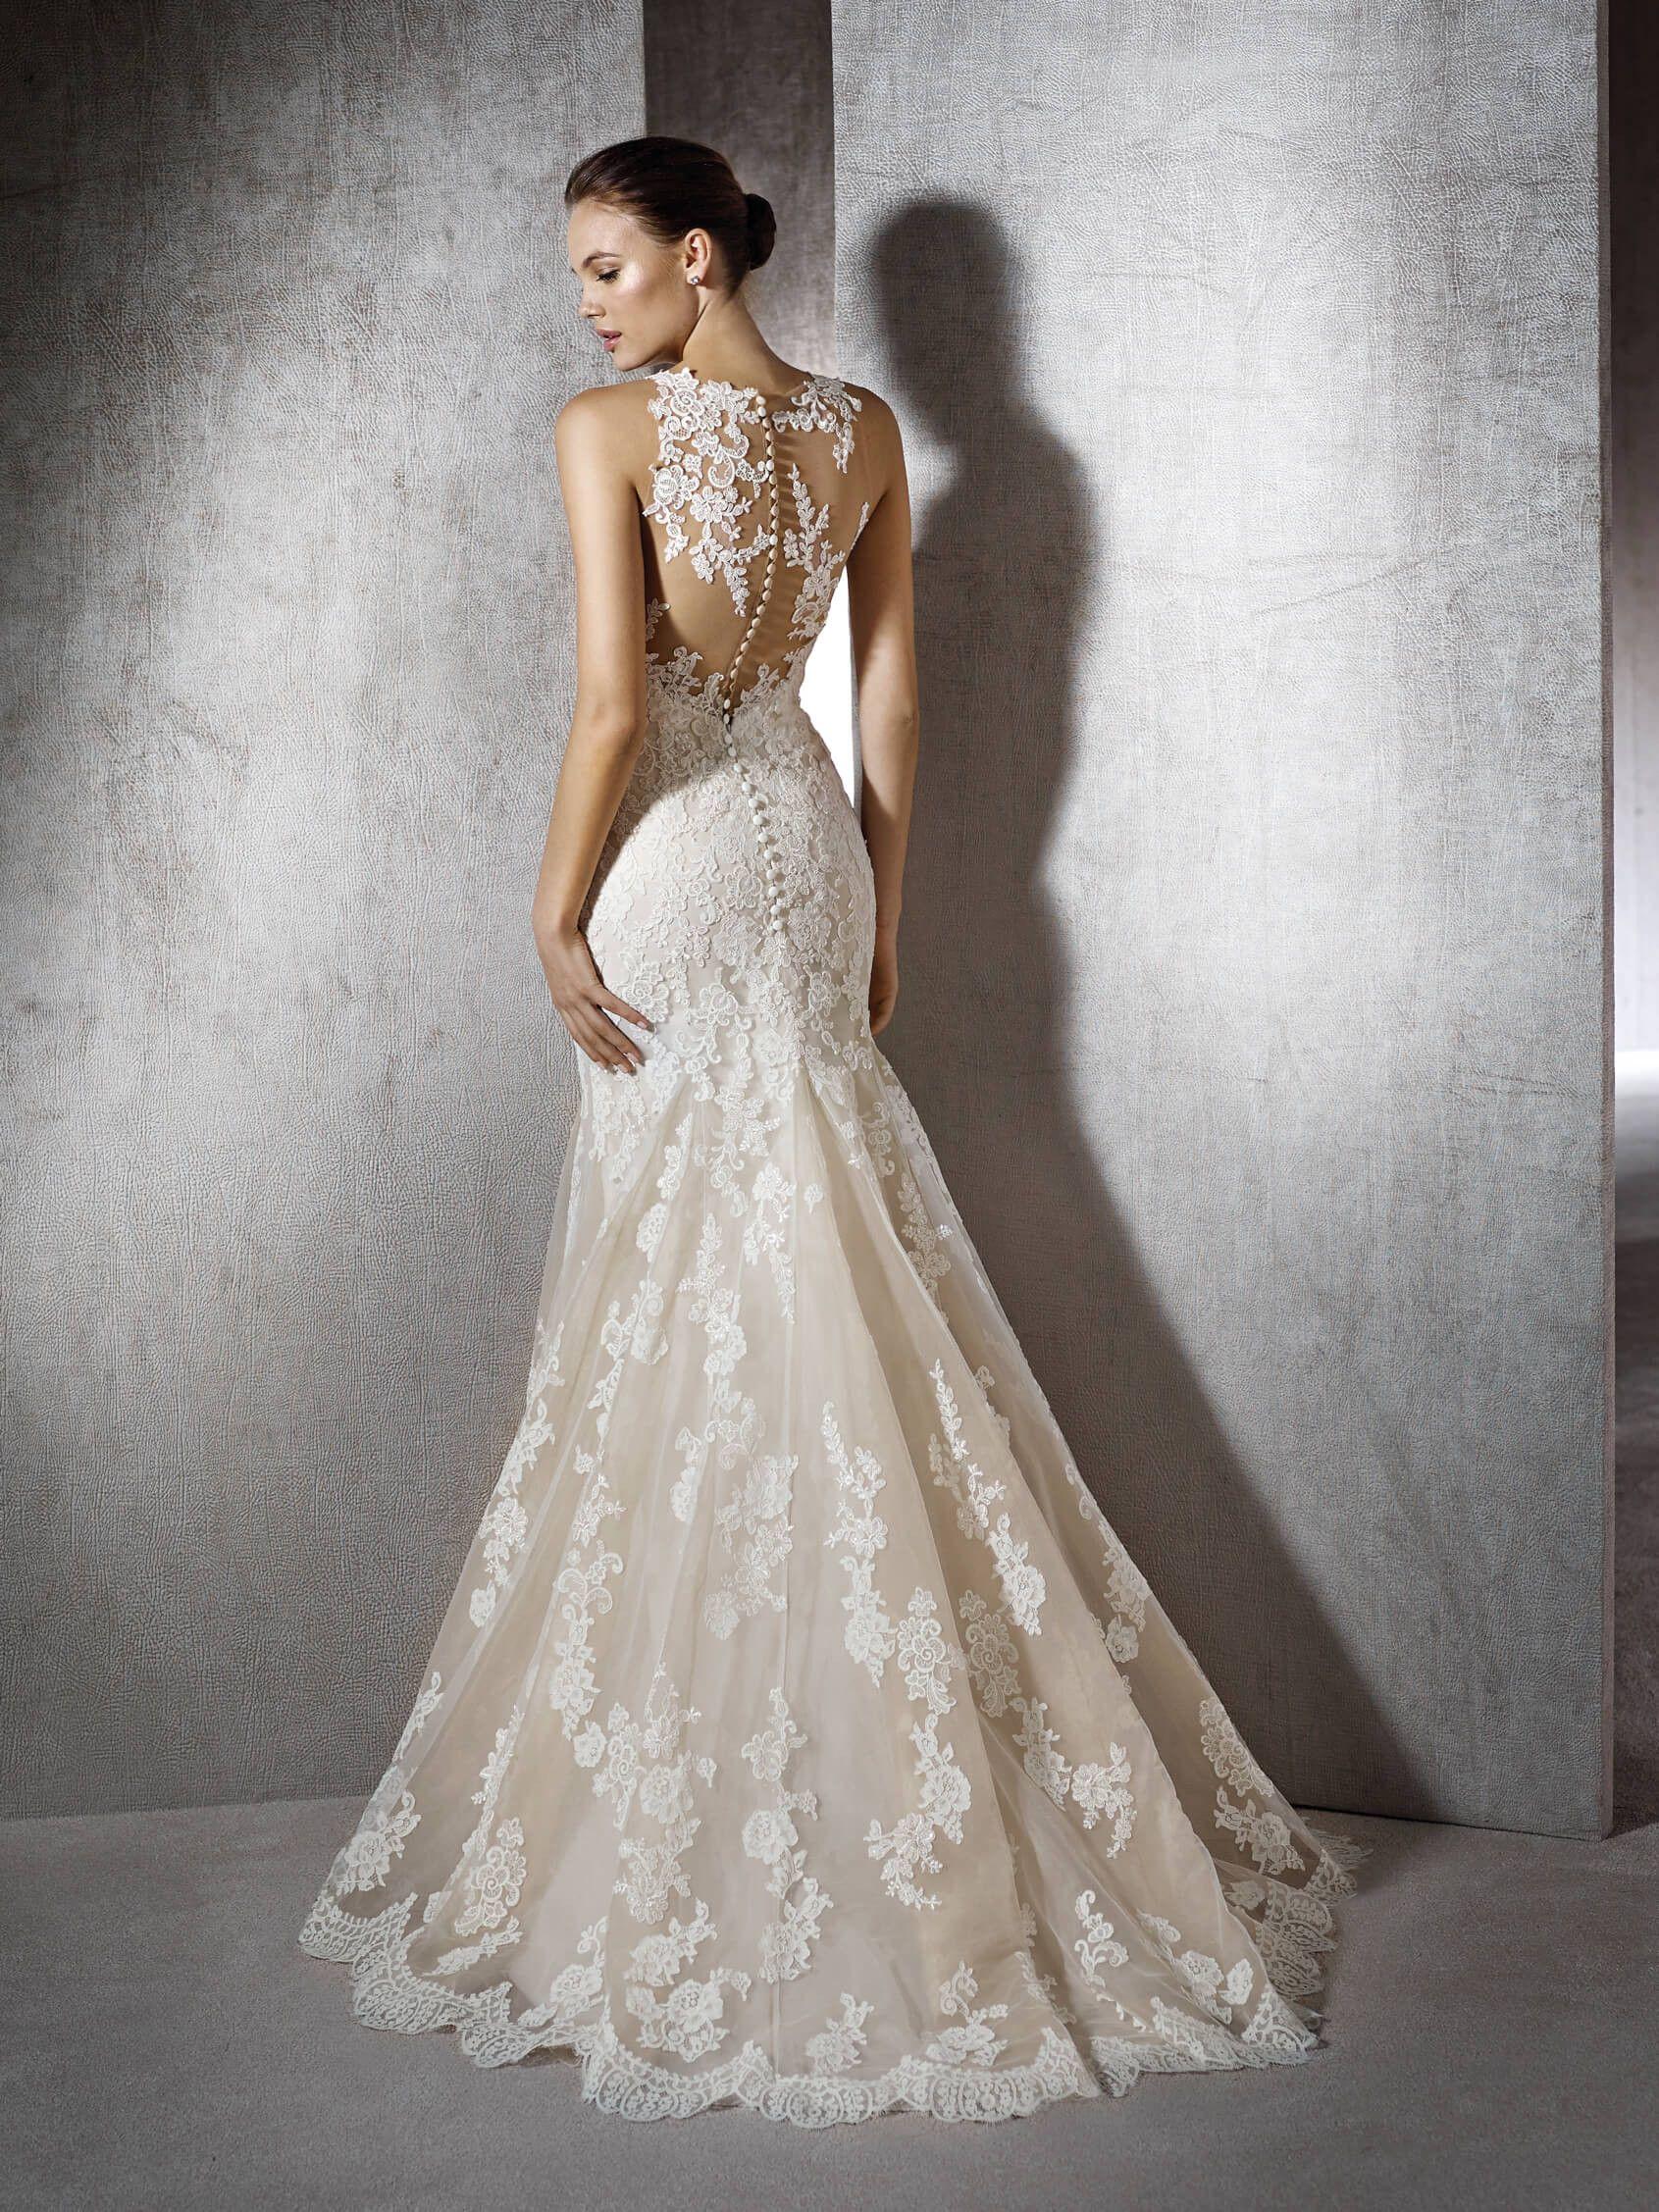 Zeneta mermaid dress, with sweetheart neckline | Mermaid/Ruffle ...